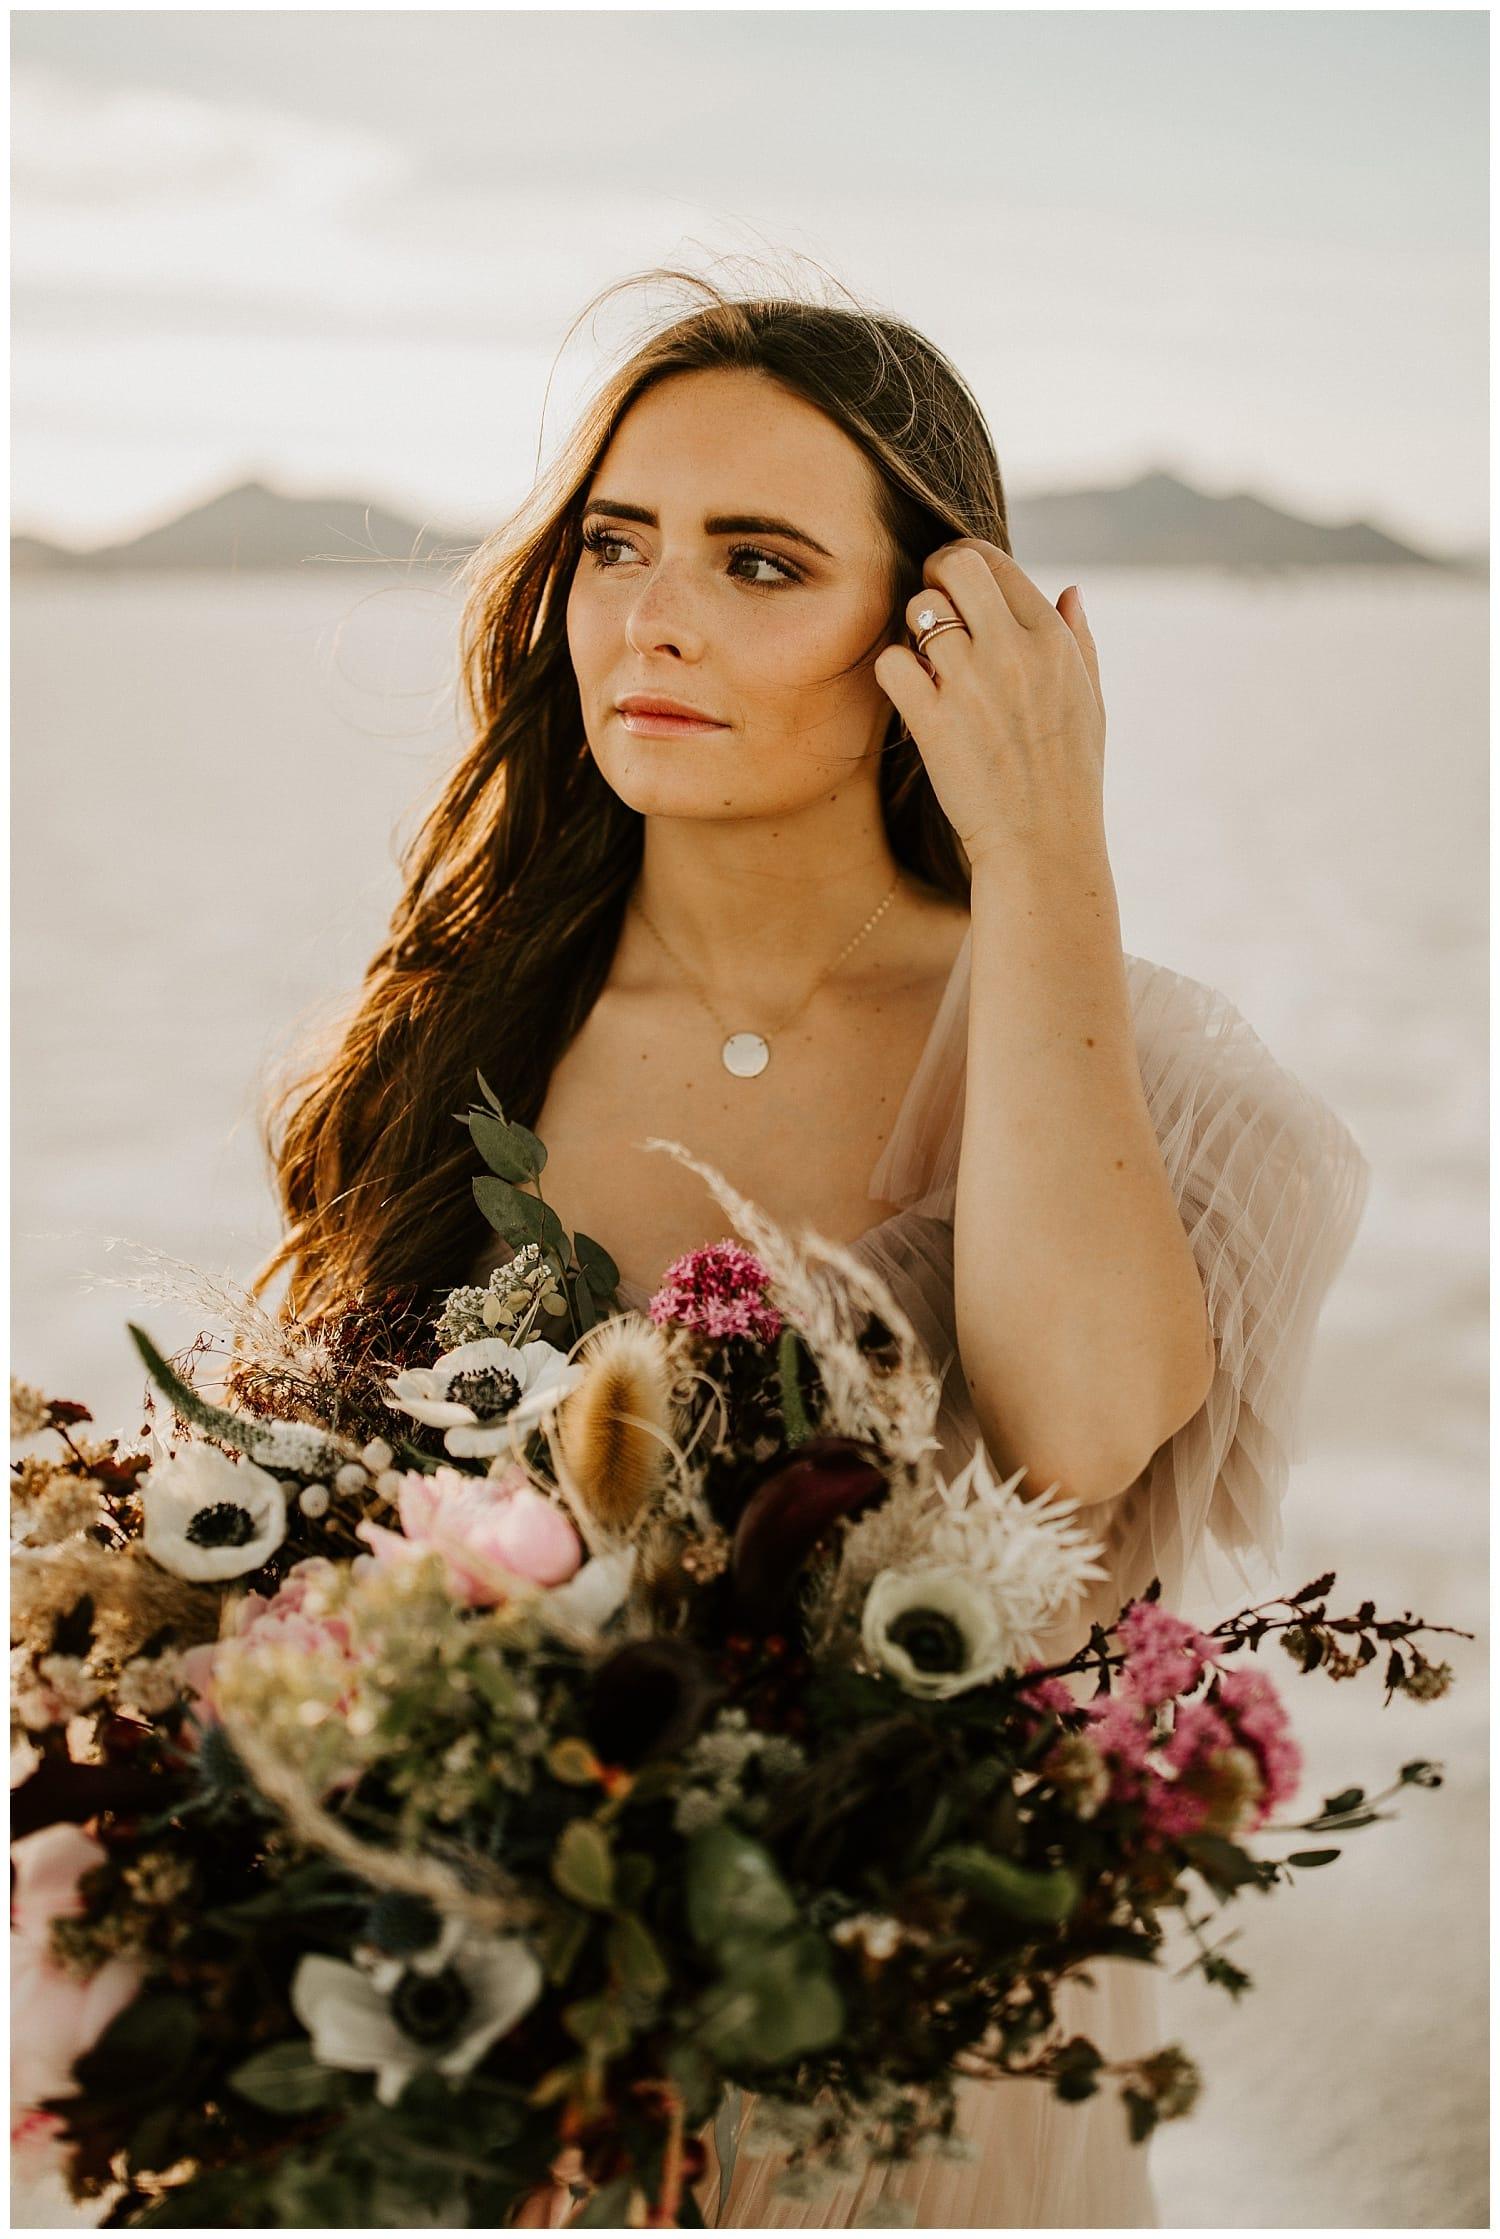 bonneville salt flats elopement, salt flats wedding, photographers in utah, utah wedding photographers